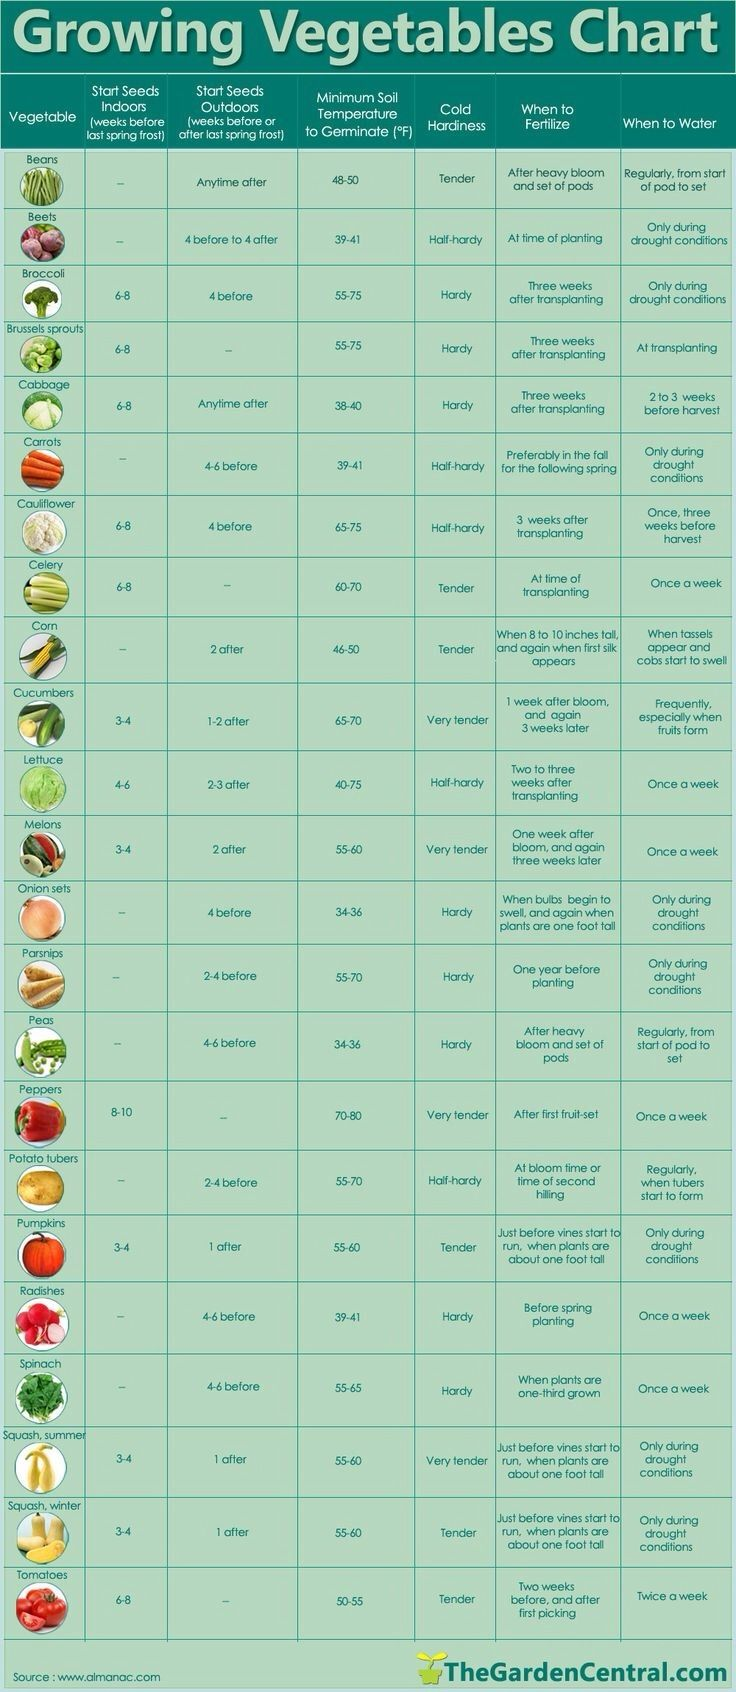 Growing Vegetables Chart Green Thumb Pinterest 400 x 300